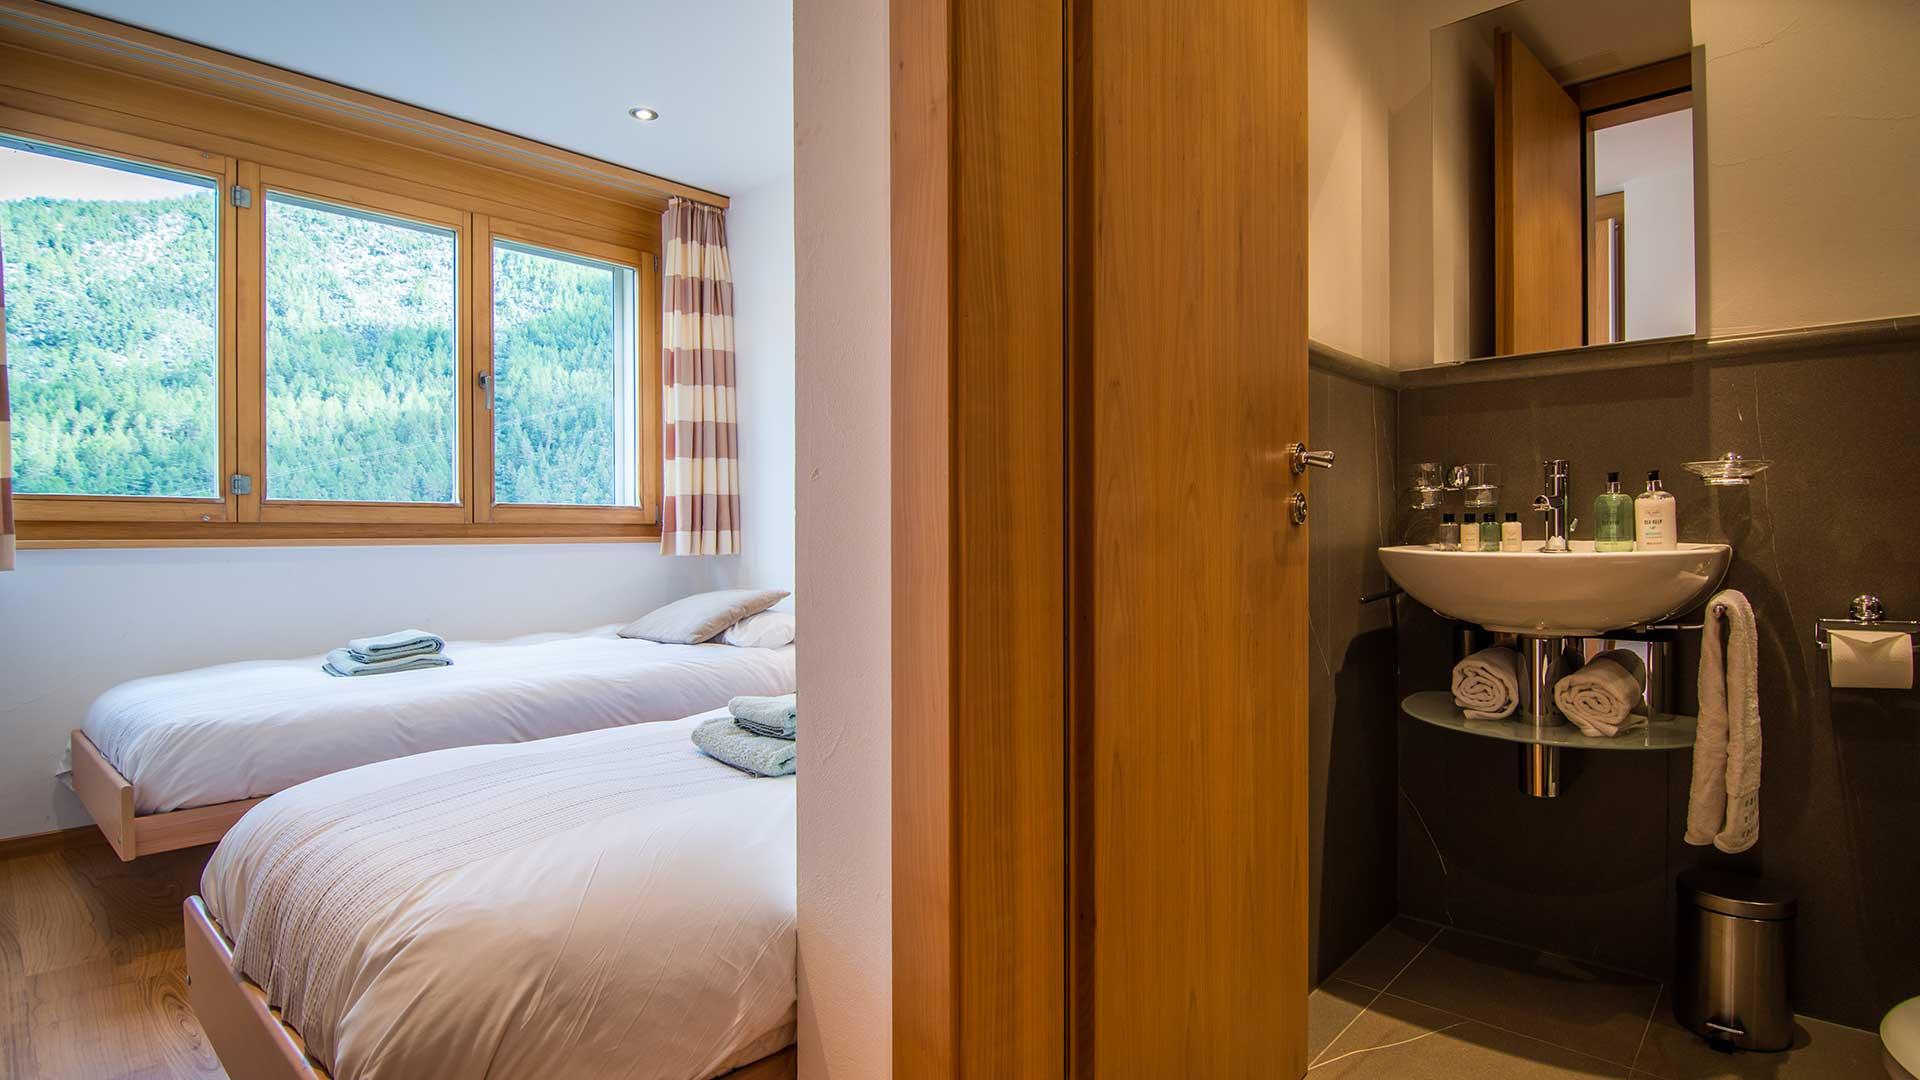 Chalet Aramis Apartments, Switzerland